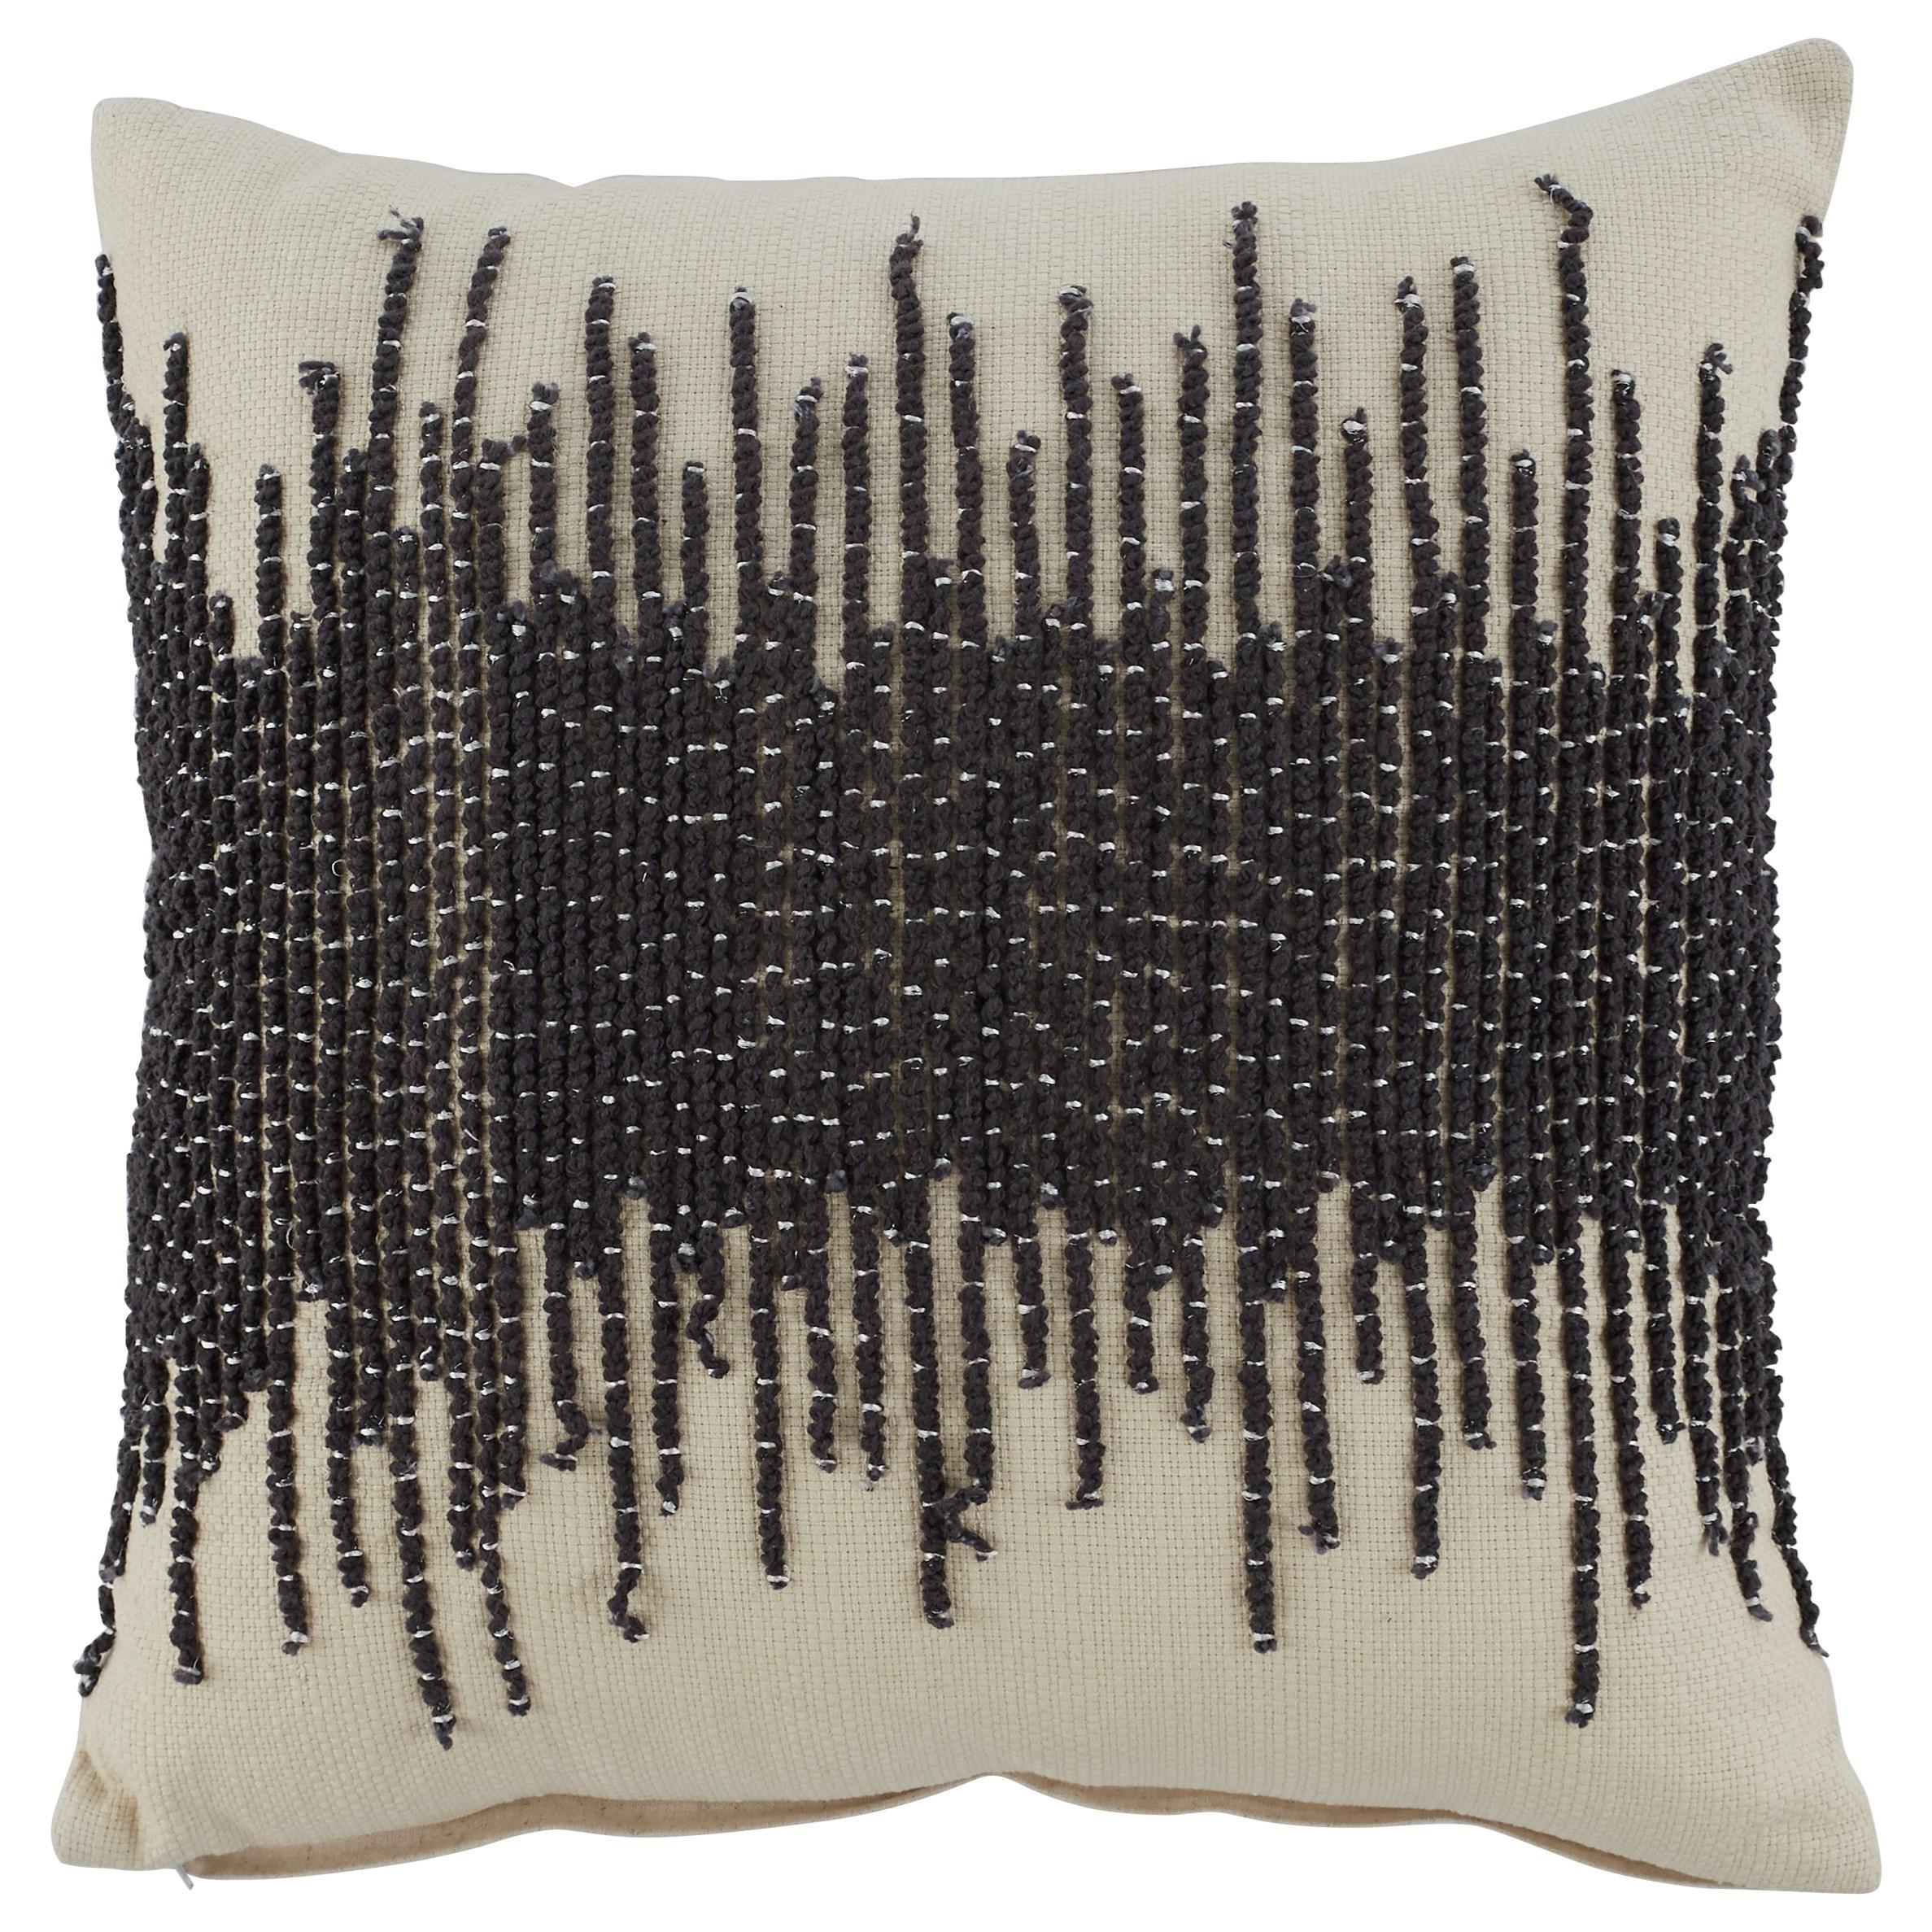 Pillows Warneka Charcoal/Cream Pillow by Ashley (Signature Design) at Johnny Janosik